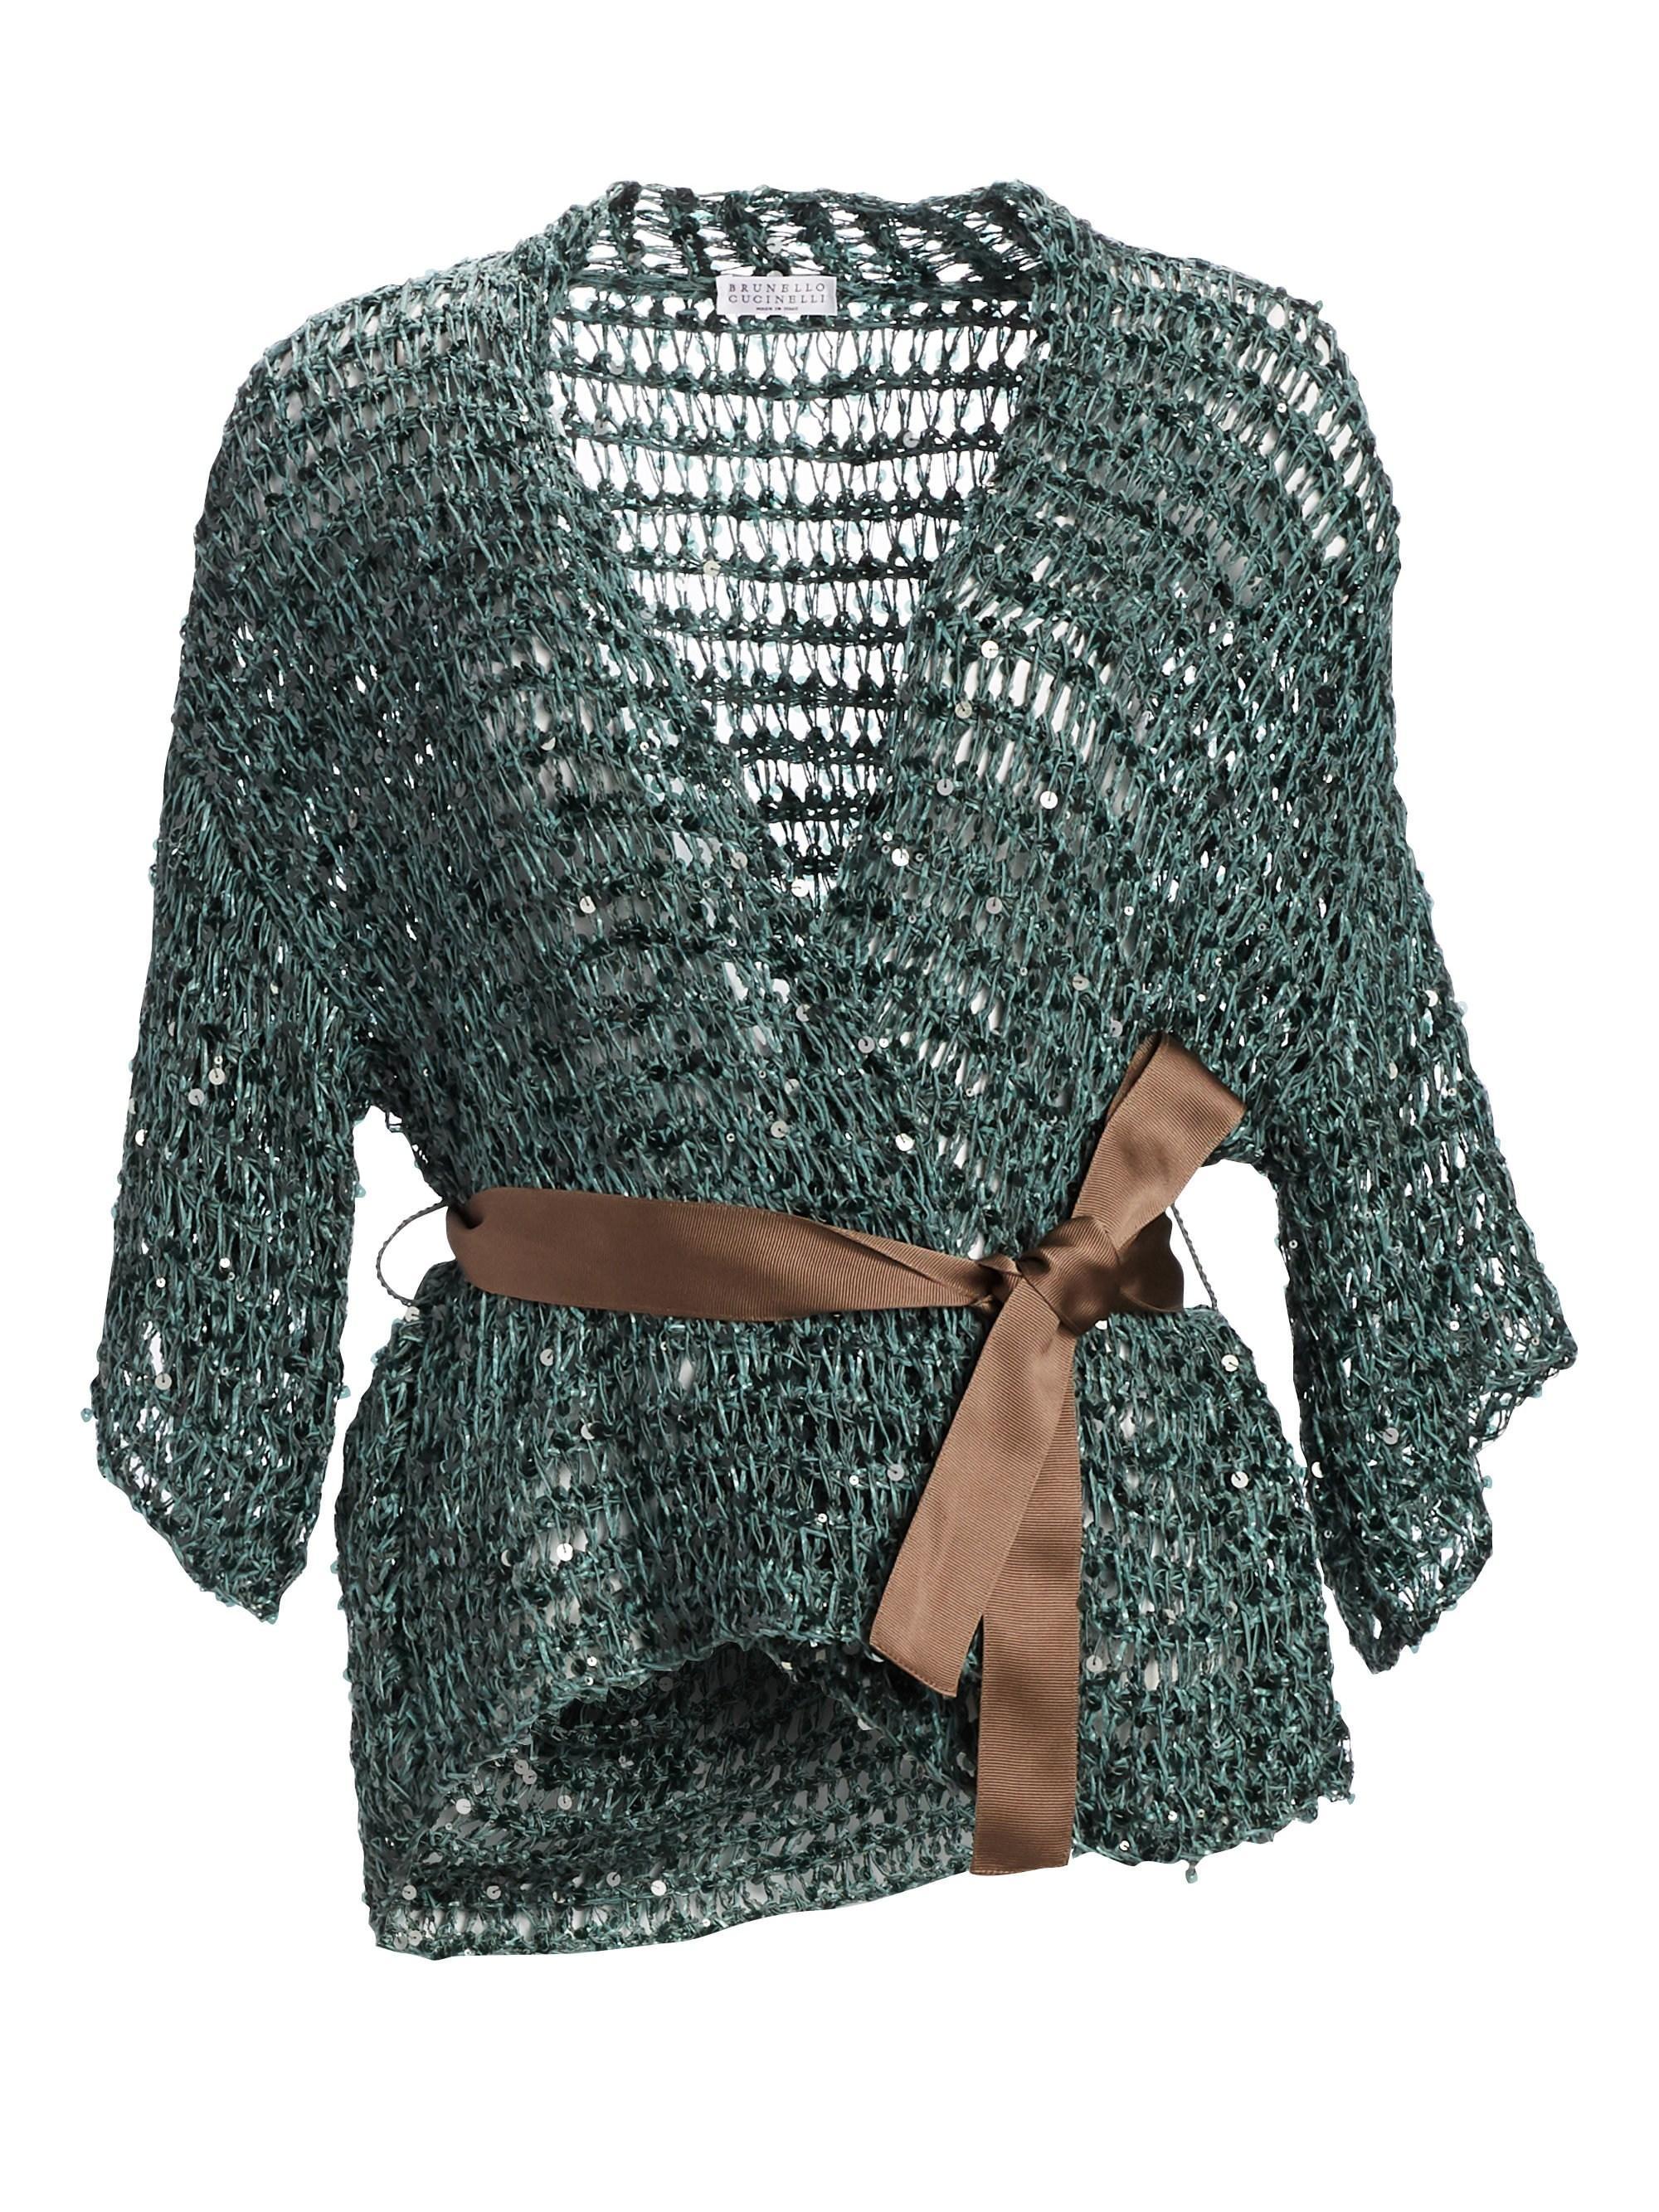 9ca493c9d8 Brunello Cucinelli - Green Paillette Knit Cardigan With Grosgrain Belt -  Lyst. View fullscreen